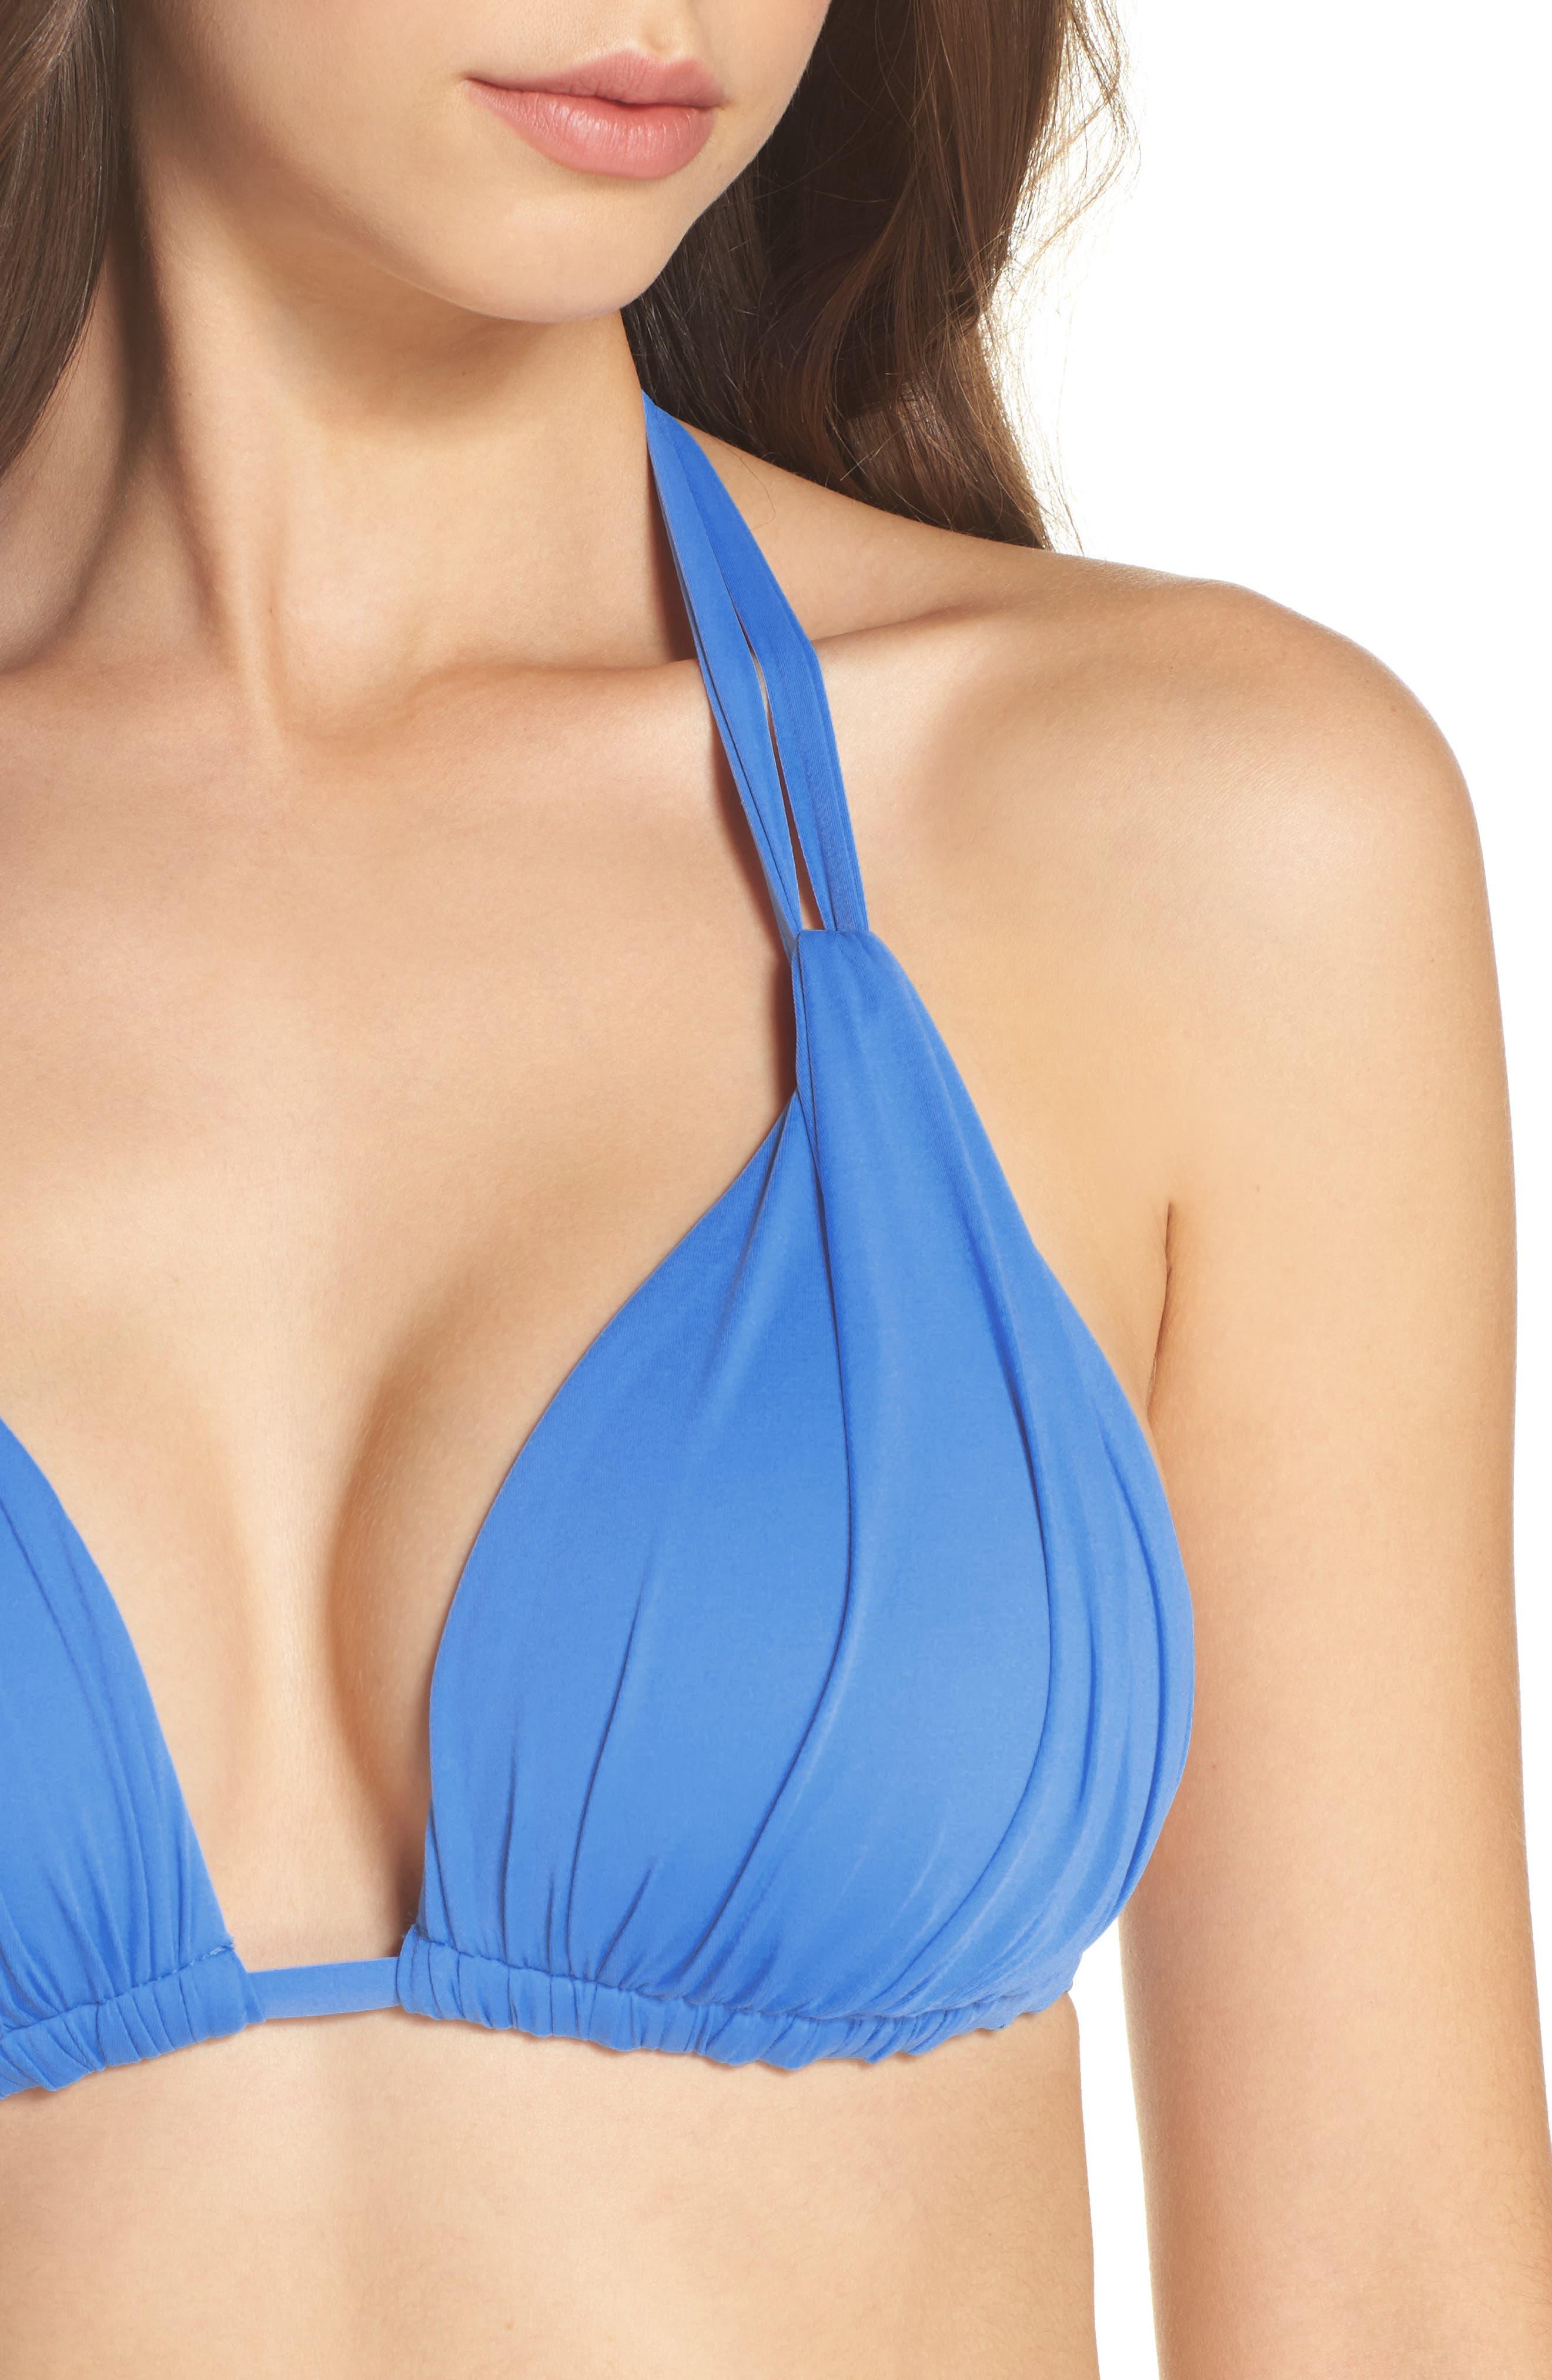 Island Blanca Halter Bikini Top,                             Alternate thumbnail 4, color,                             Blue Suede